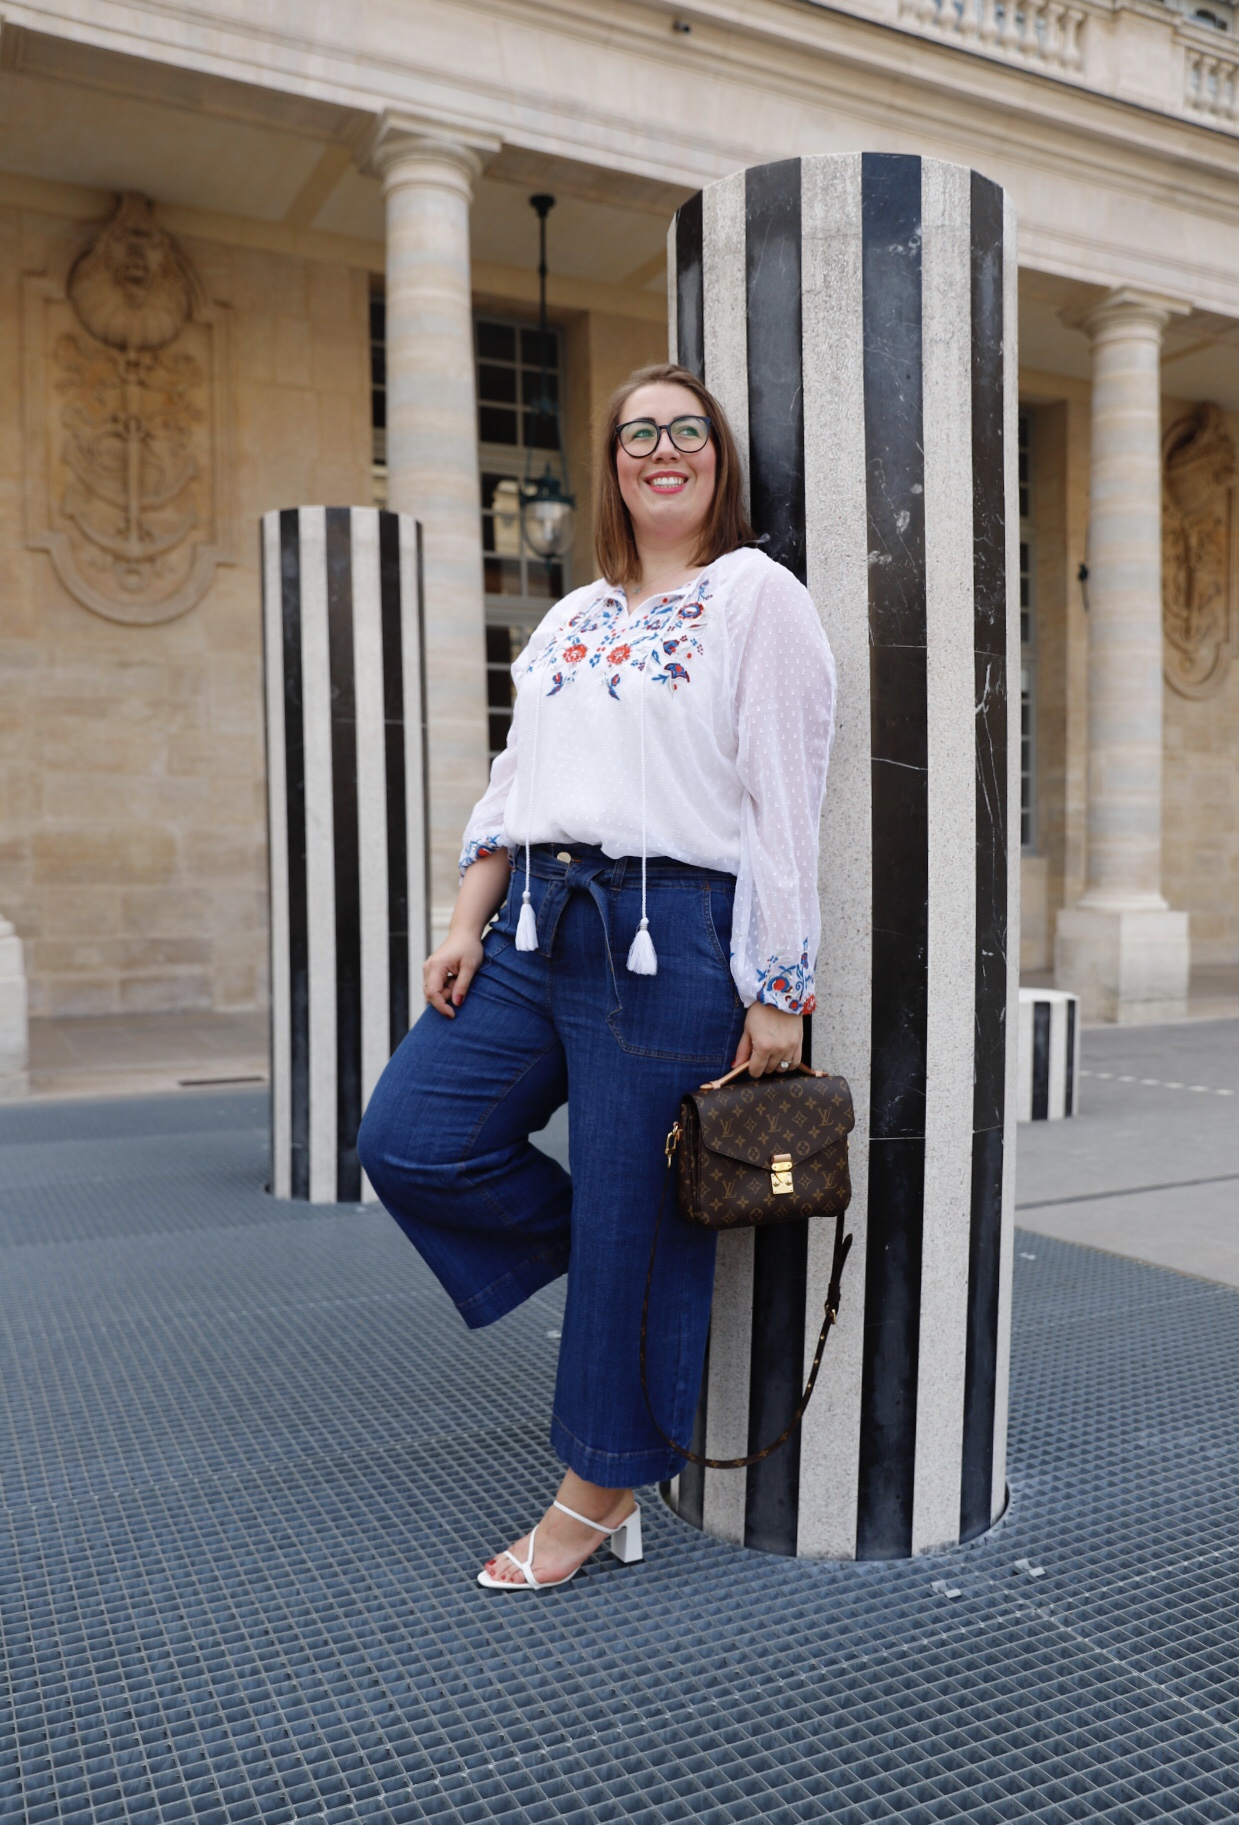 Susanne-Heidebach-Sheego-Outfit-Palais-Royal-Paris-Boho-Jeans-Culotte-Streifen-Blumen-Denim-kombinieren